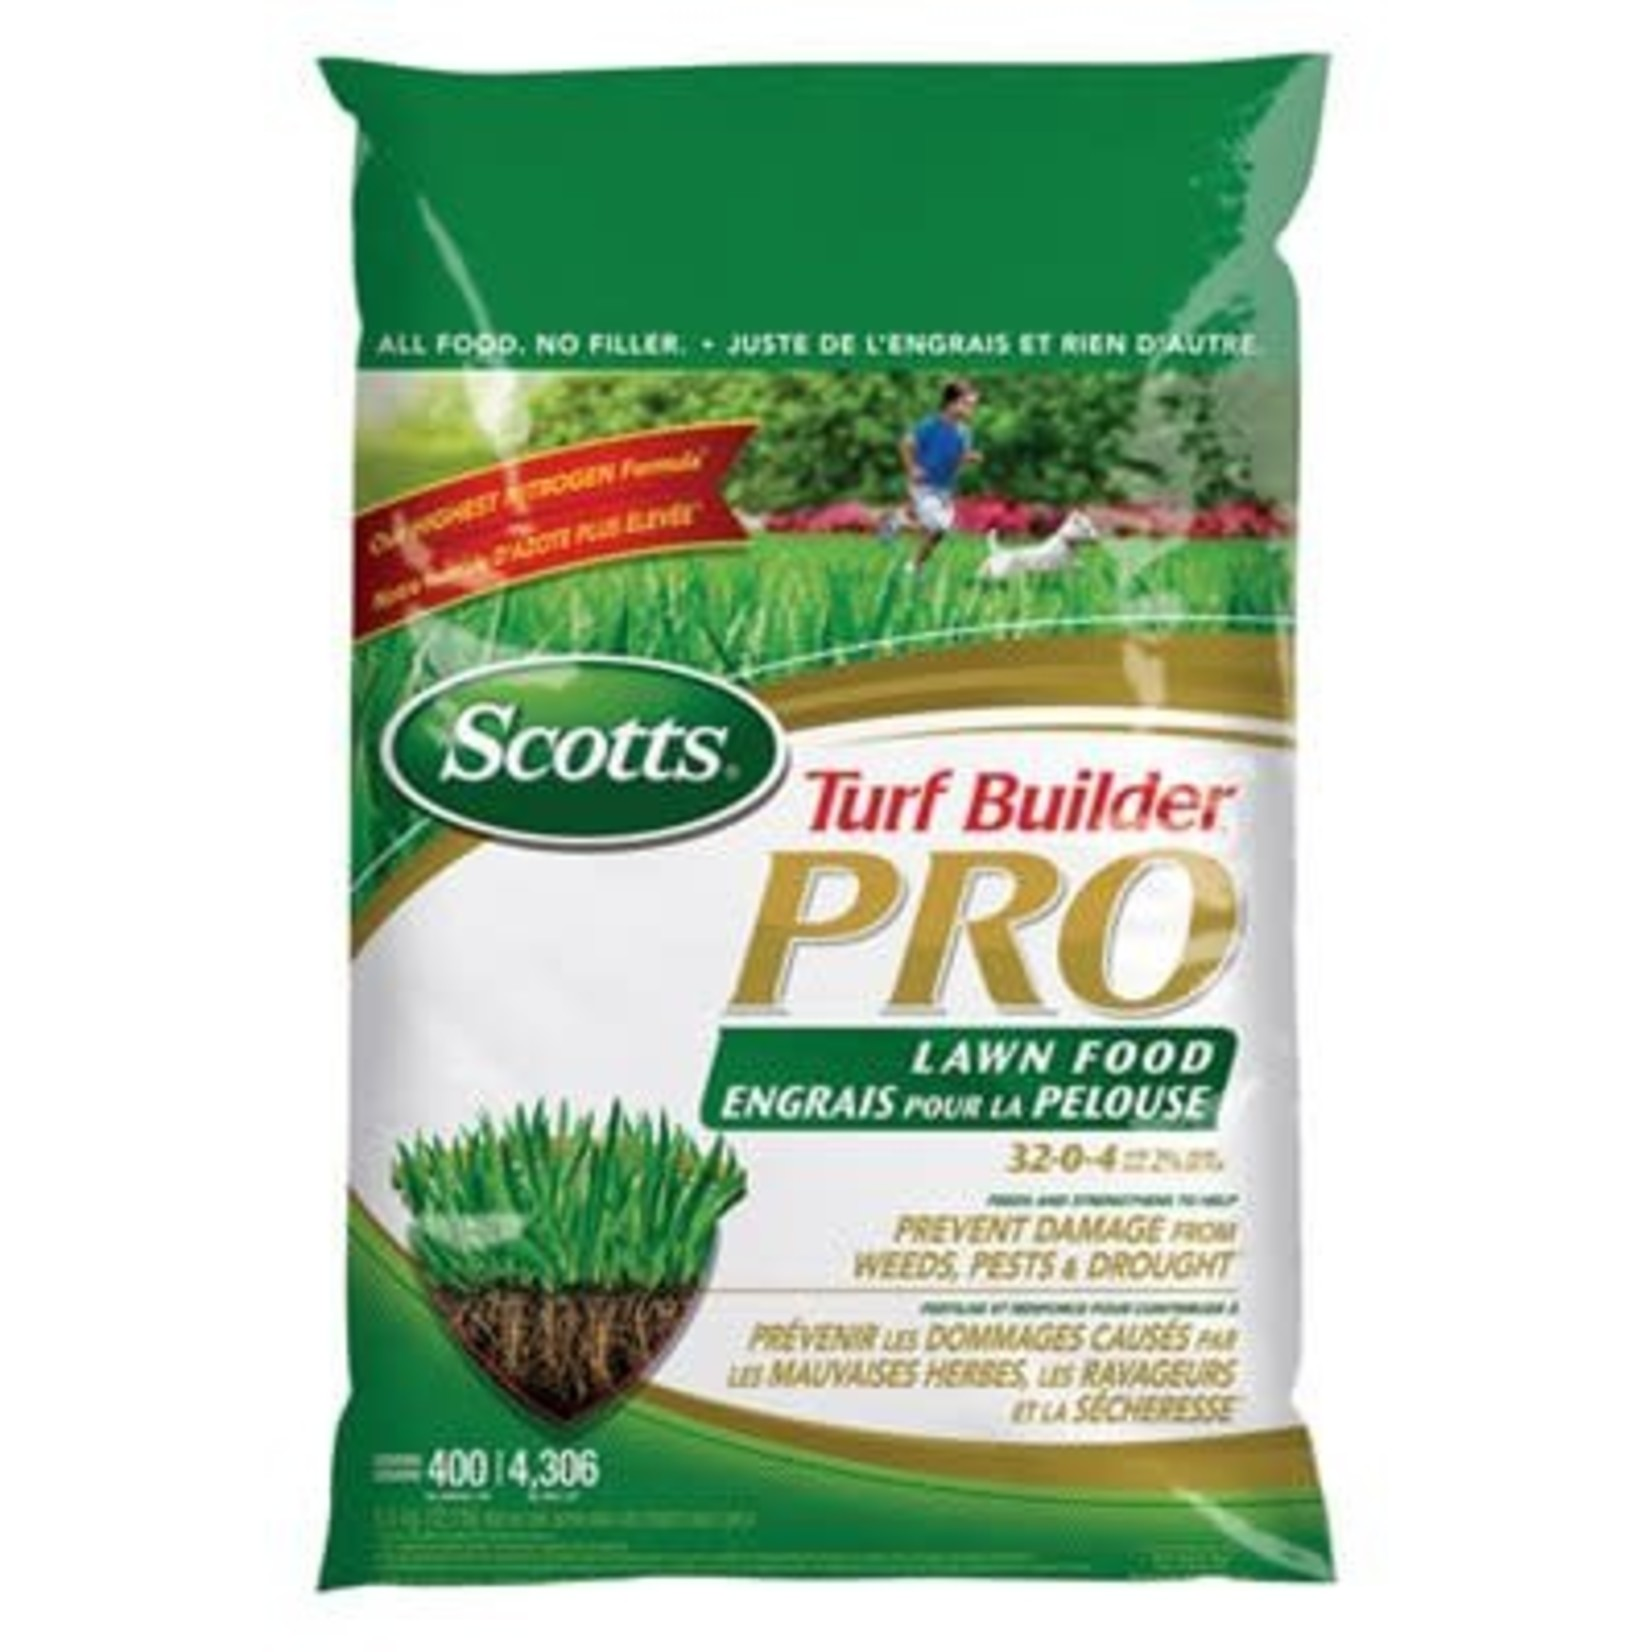 Scotts Turf Builder Pro 32-0-4, 5.2kg